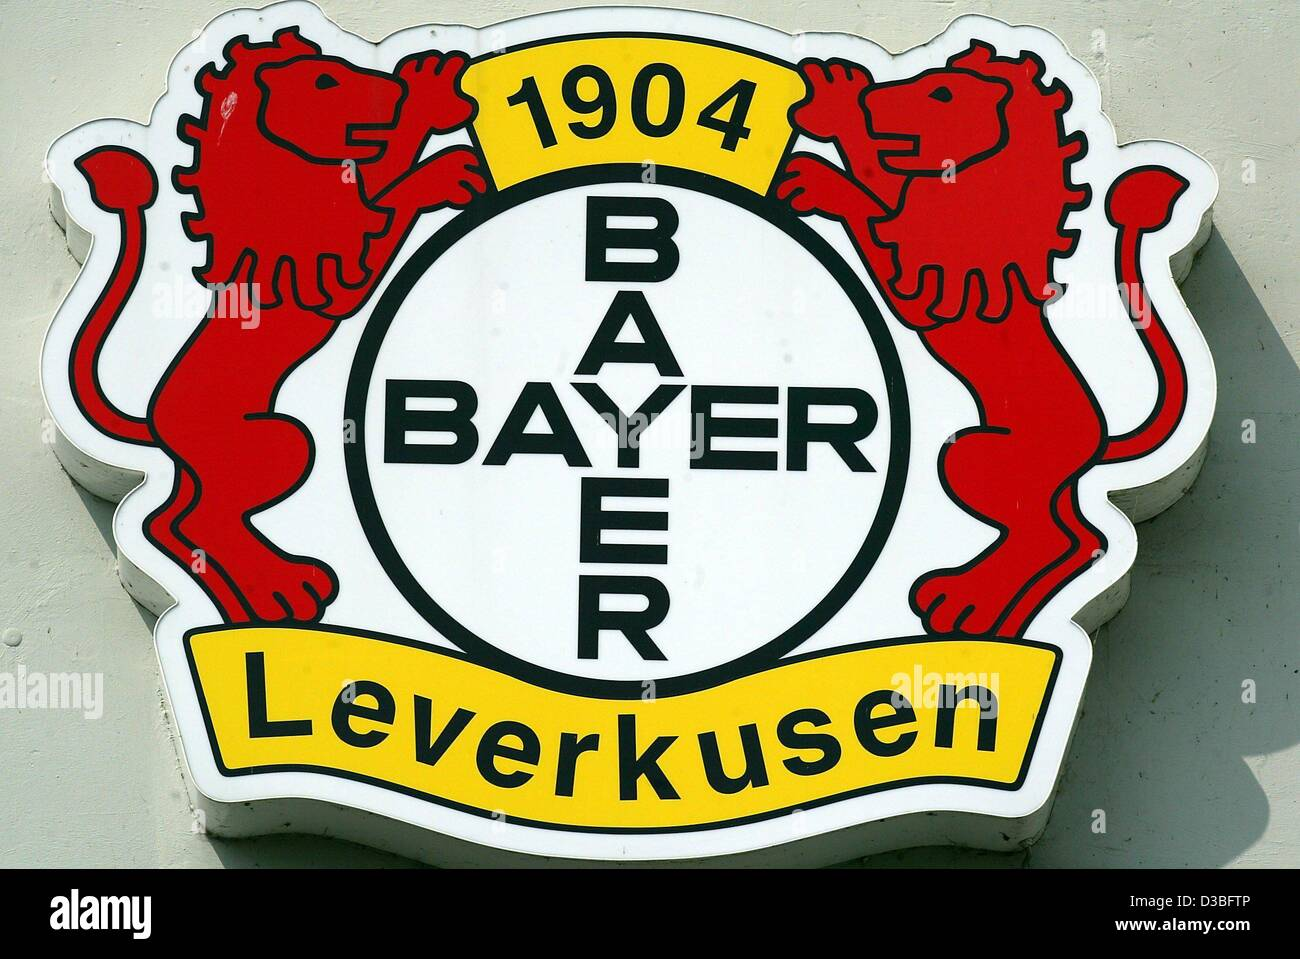 (dpa) - The logo of the German soccer club Bayer Leverkusen, pictured in Leverkusen, Germany, 24 June 2003. - Stock Image